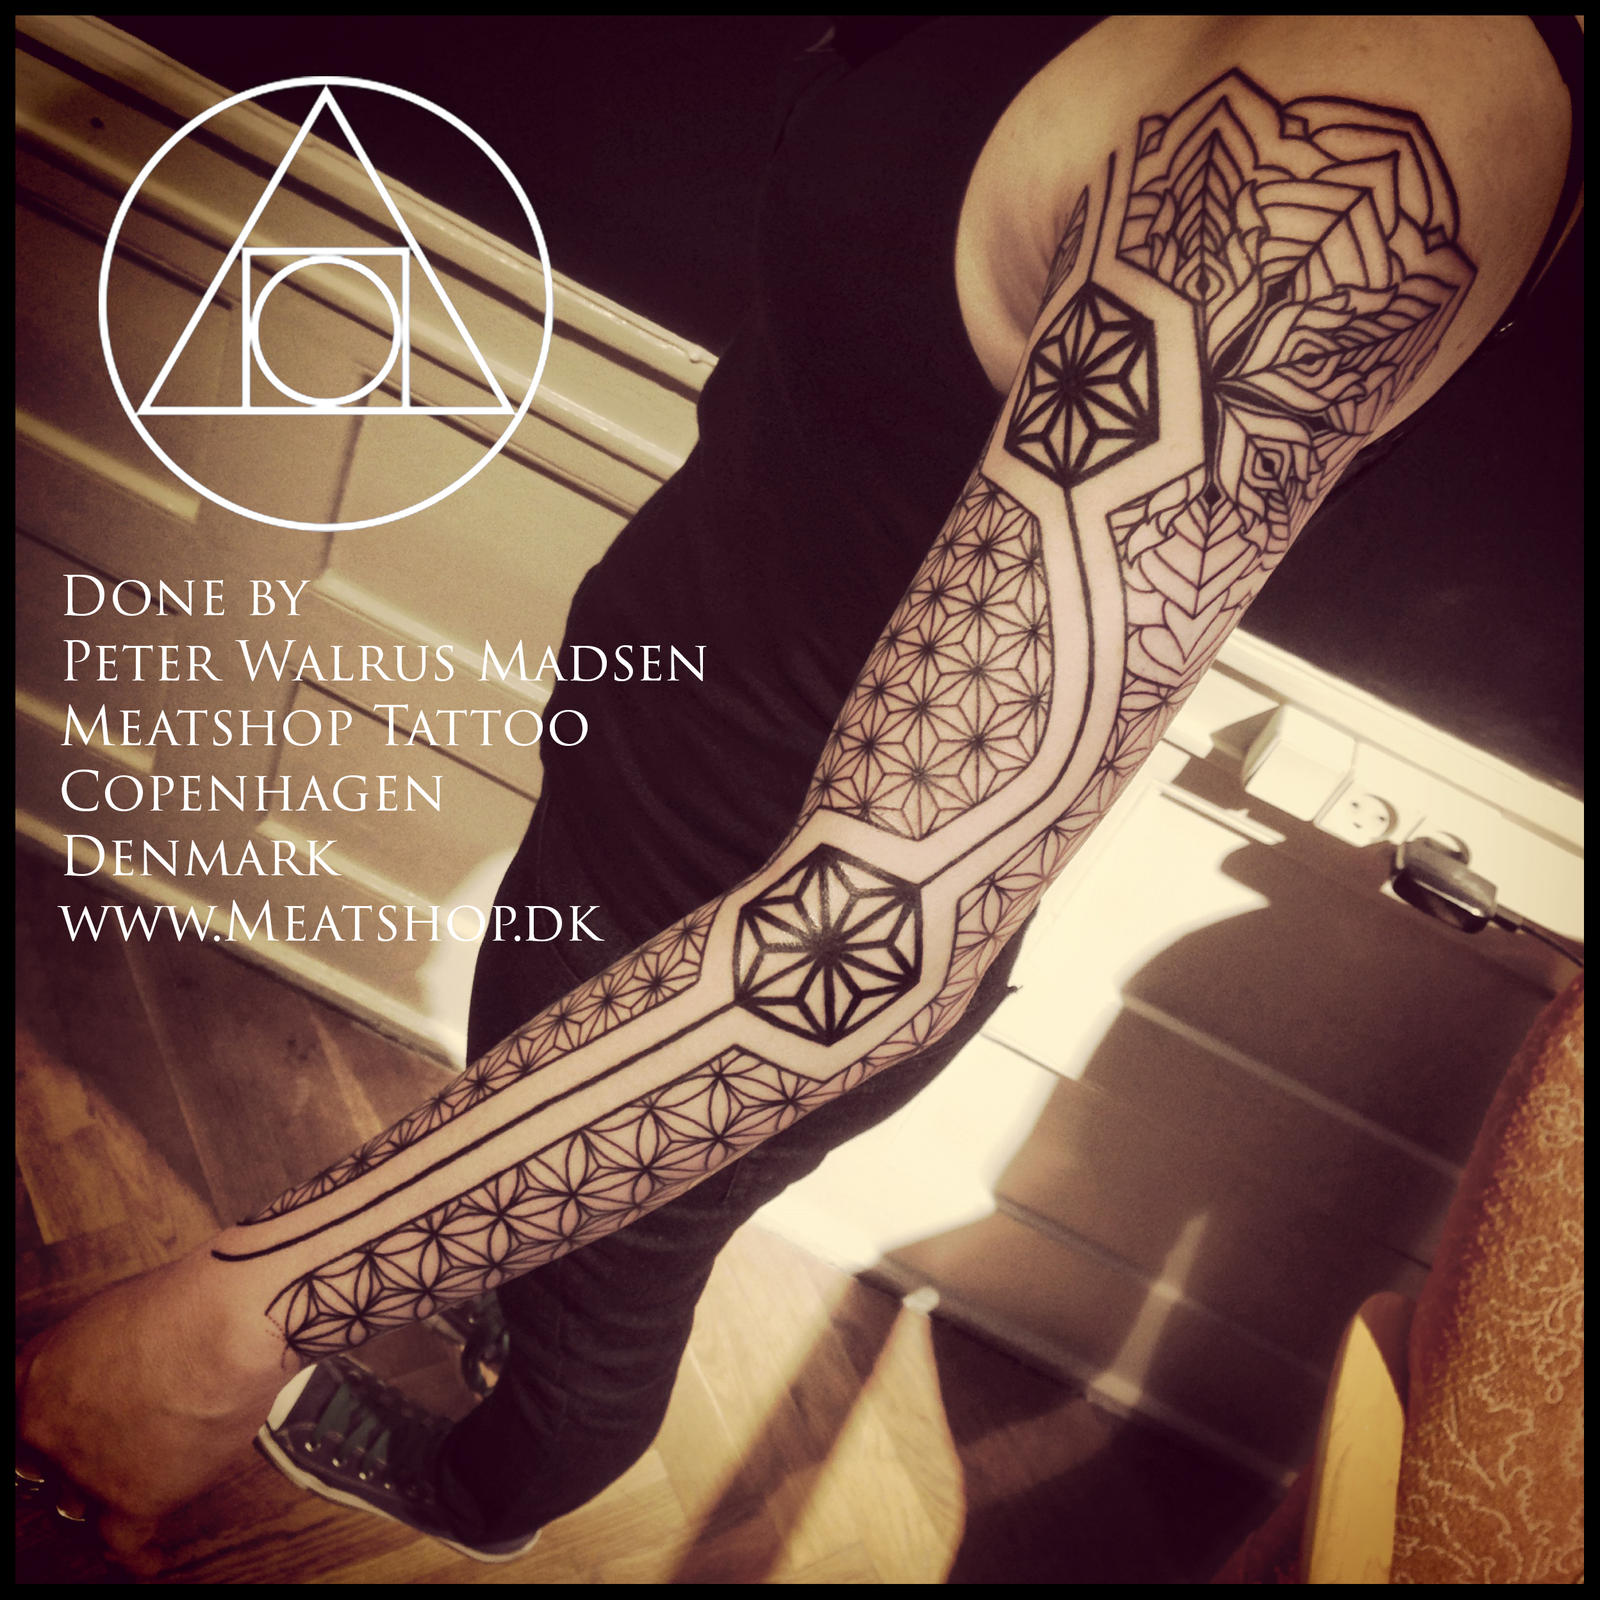 Sleeve of Asanoha tattoo by Meatshop-Tattoo